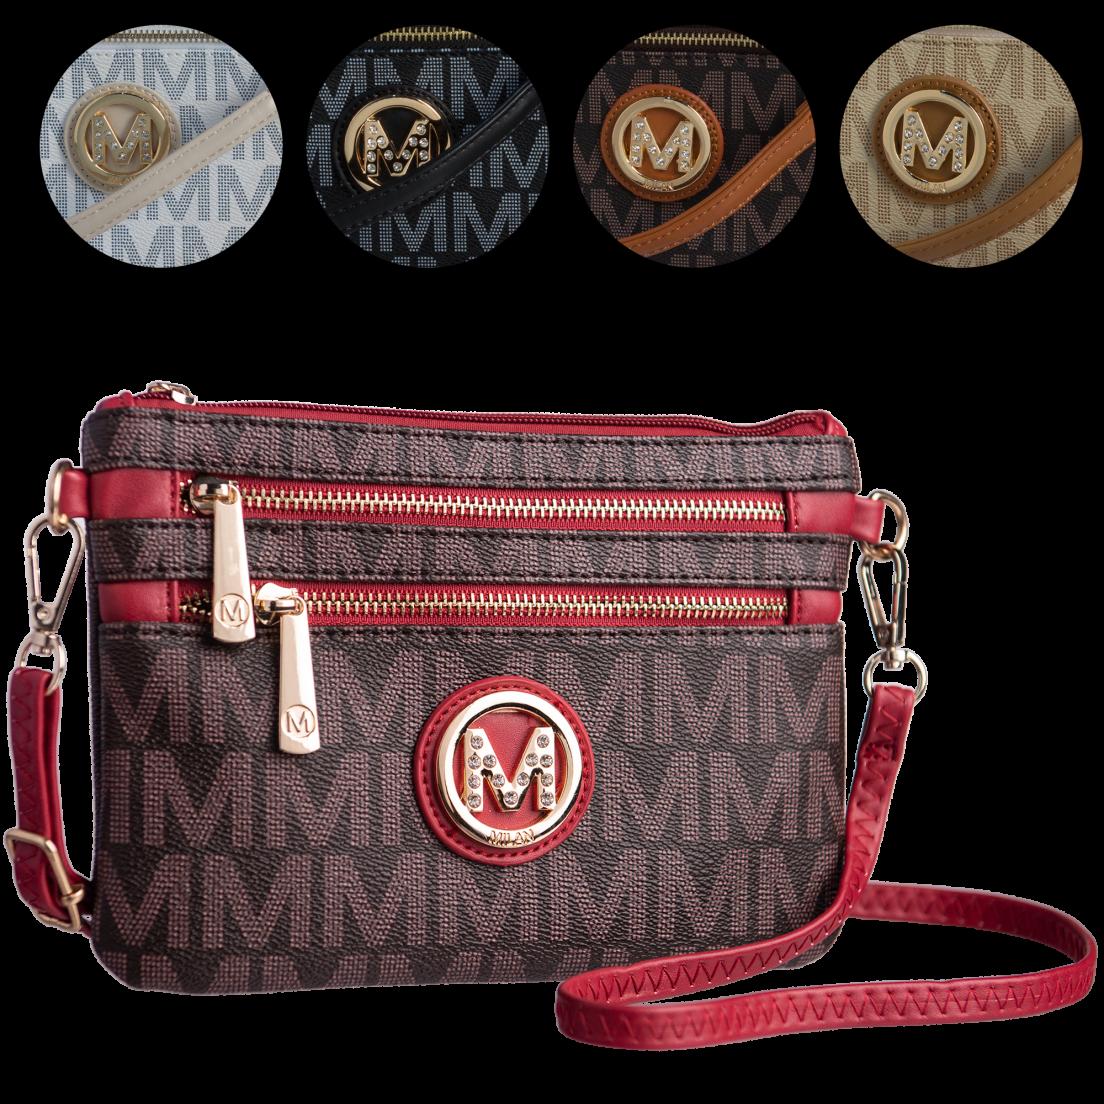 Milan Imports Crossbody-Wristlet Combo Handbag 1b45b314e8891